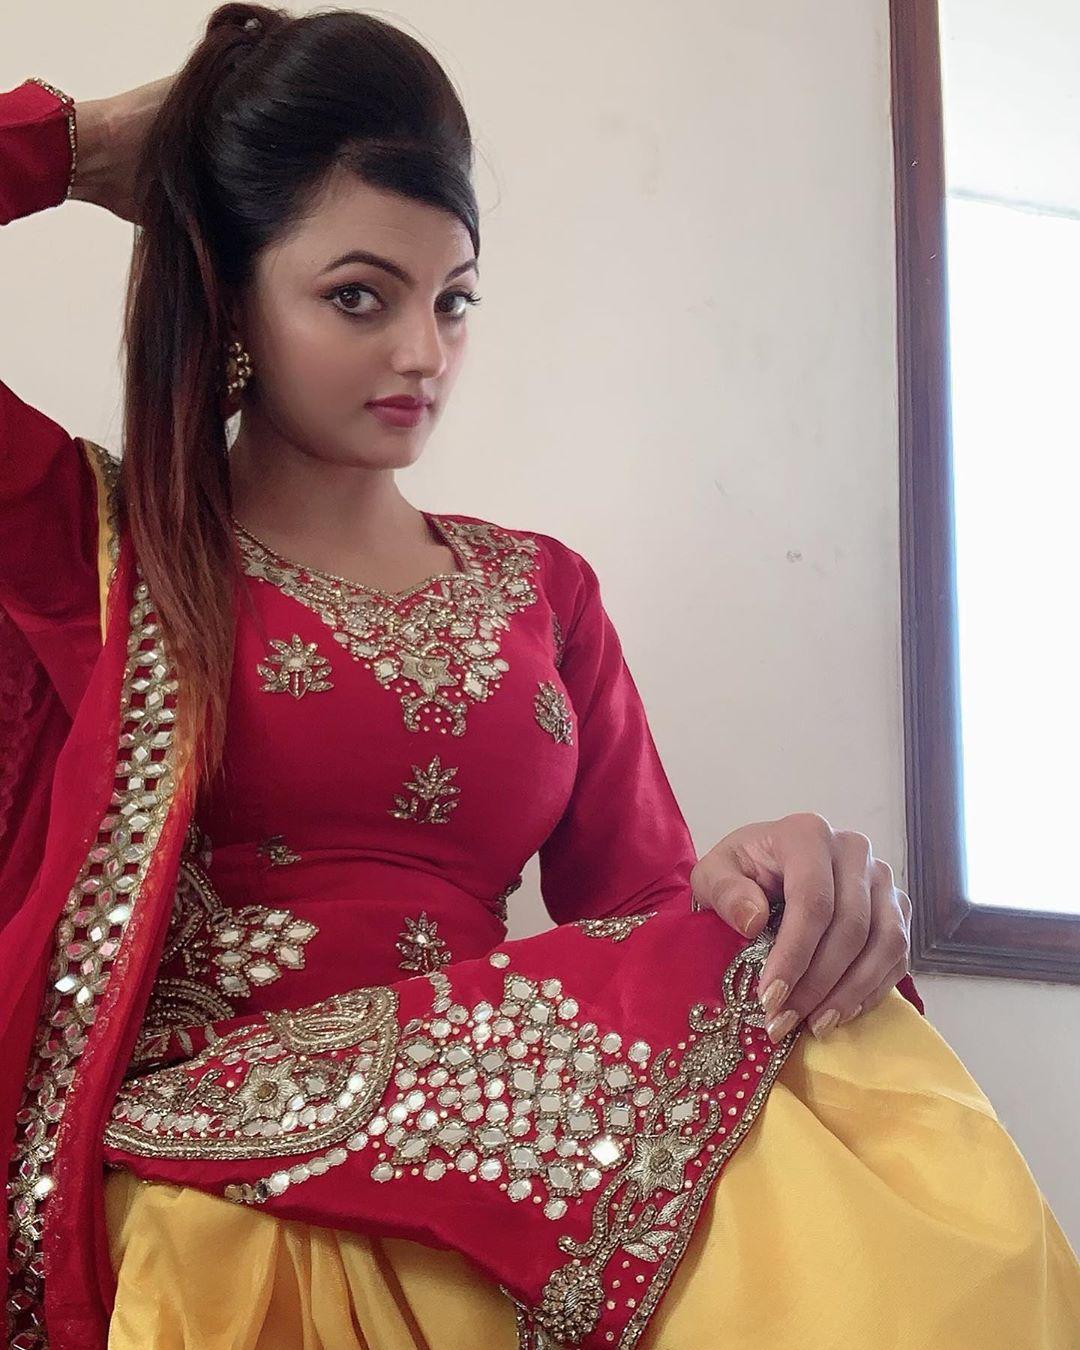 jasmeen-jassi-singer-news